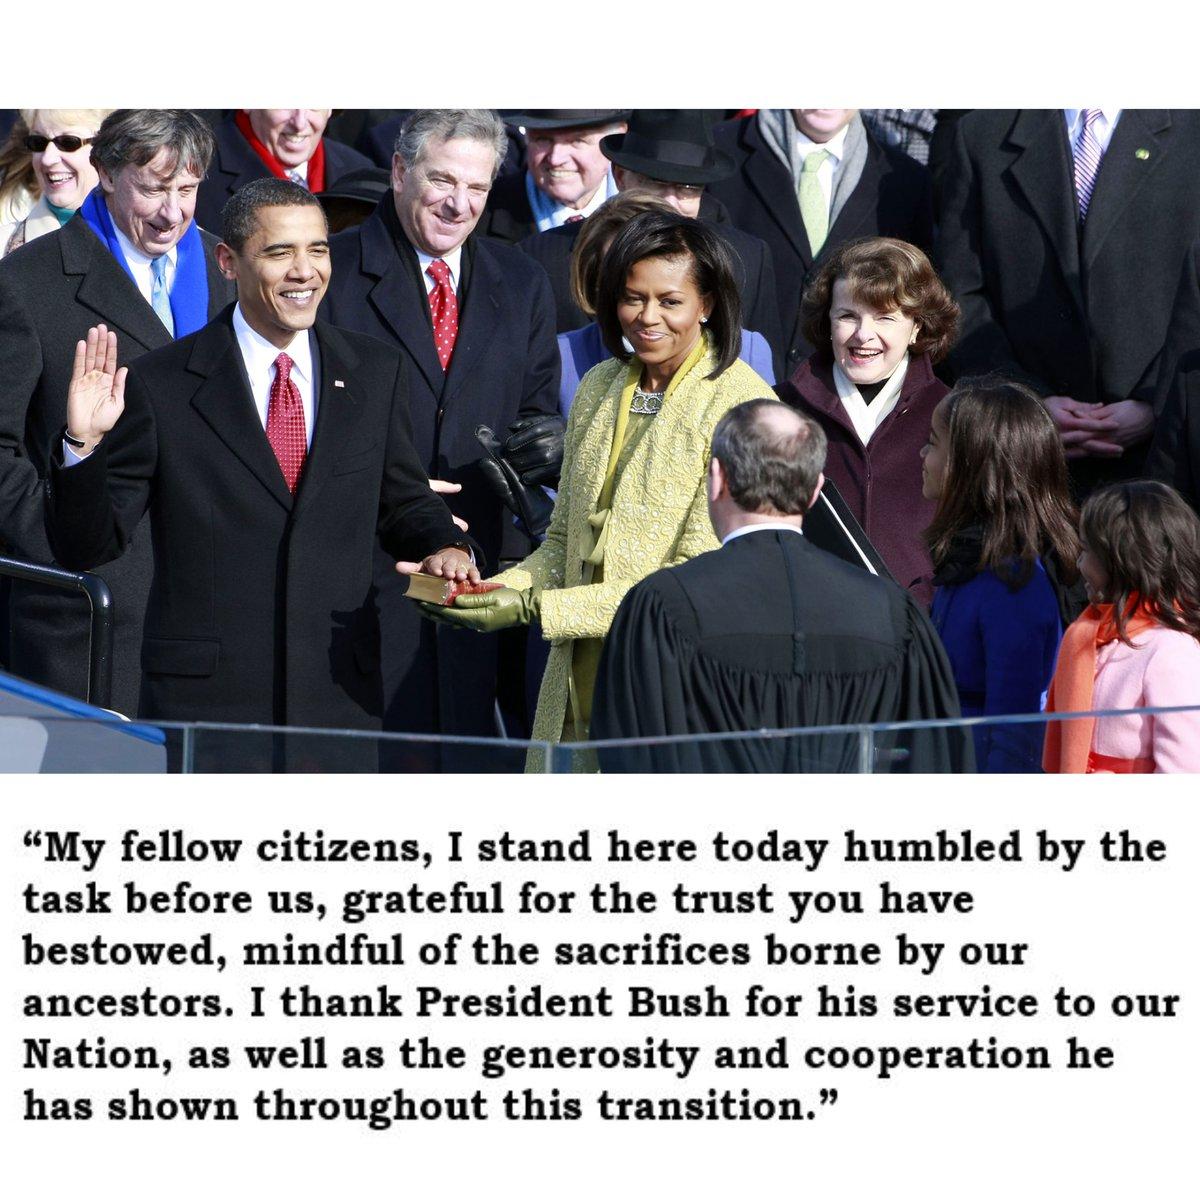 Barack Obama became the 44th President of the United States #OTD in 2009.